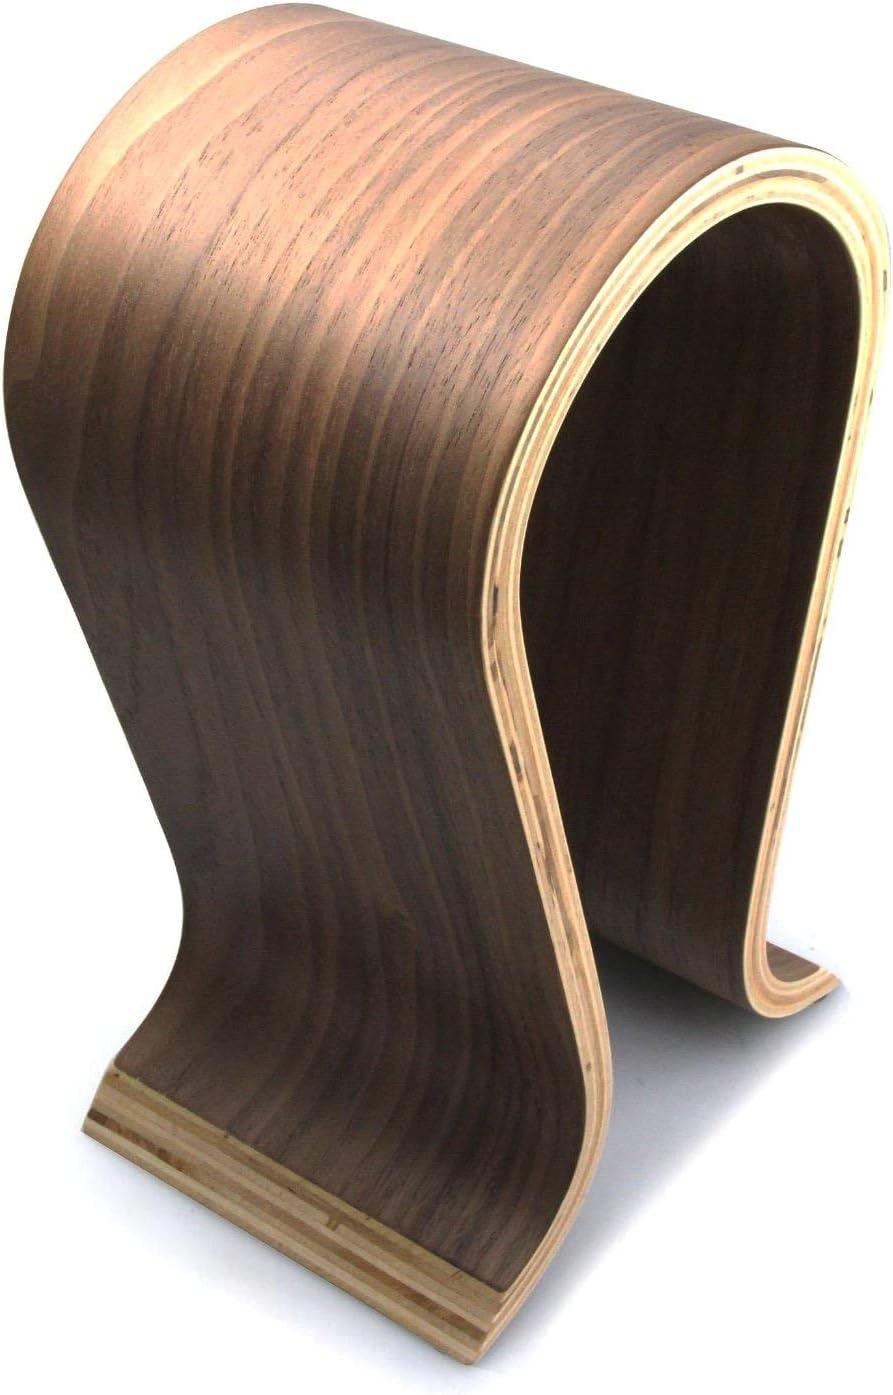 Wooden Omega Headphones Stand/Hanger / Holder - Walnut Finish